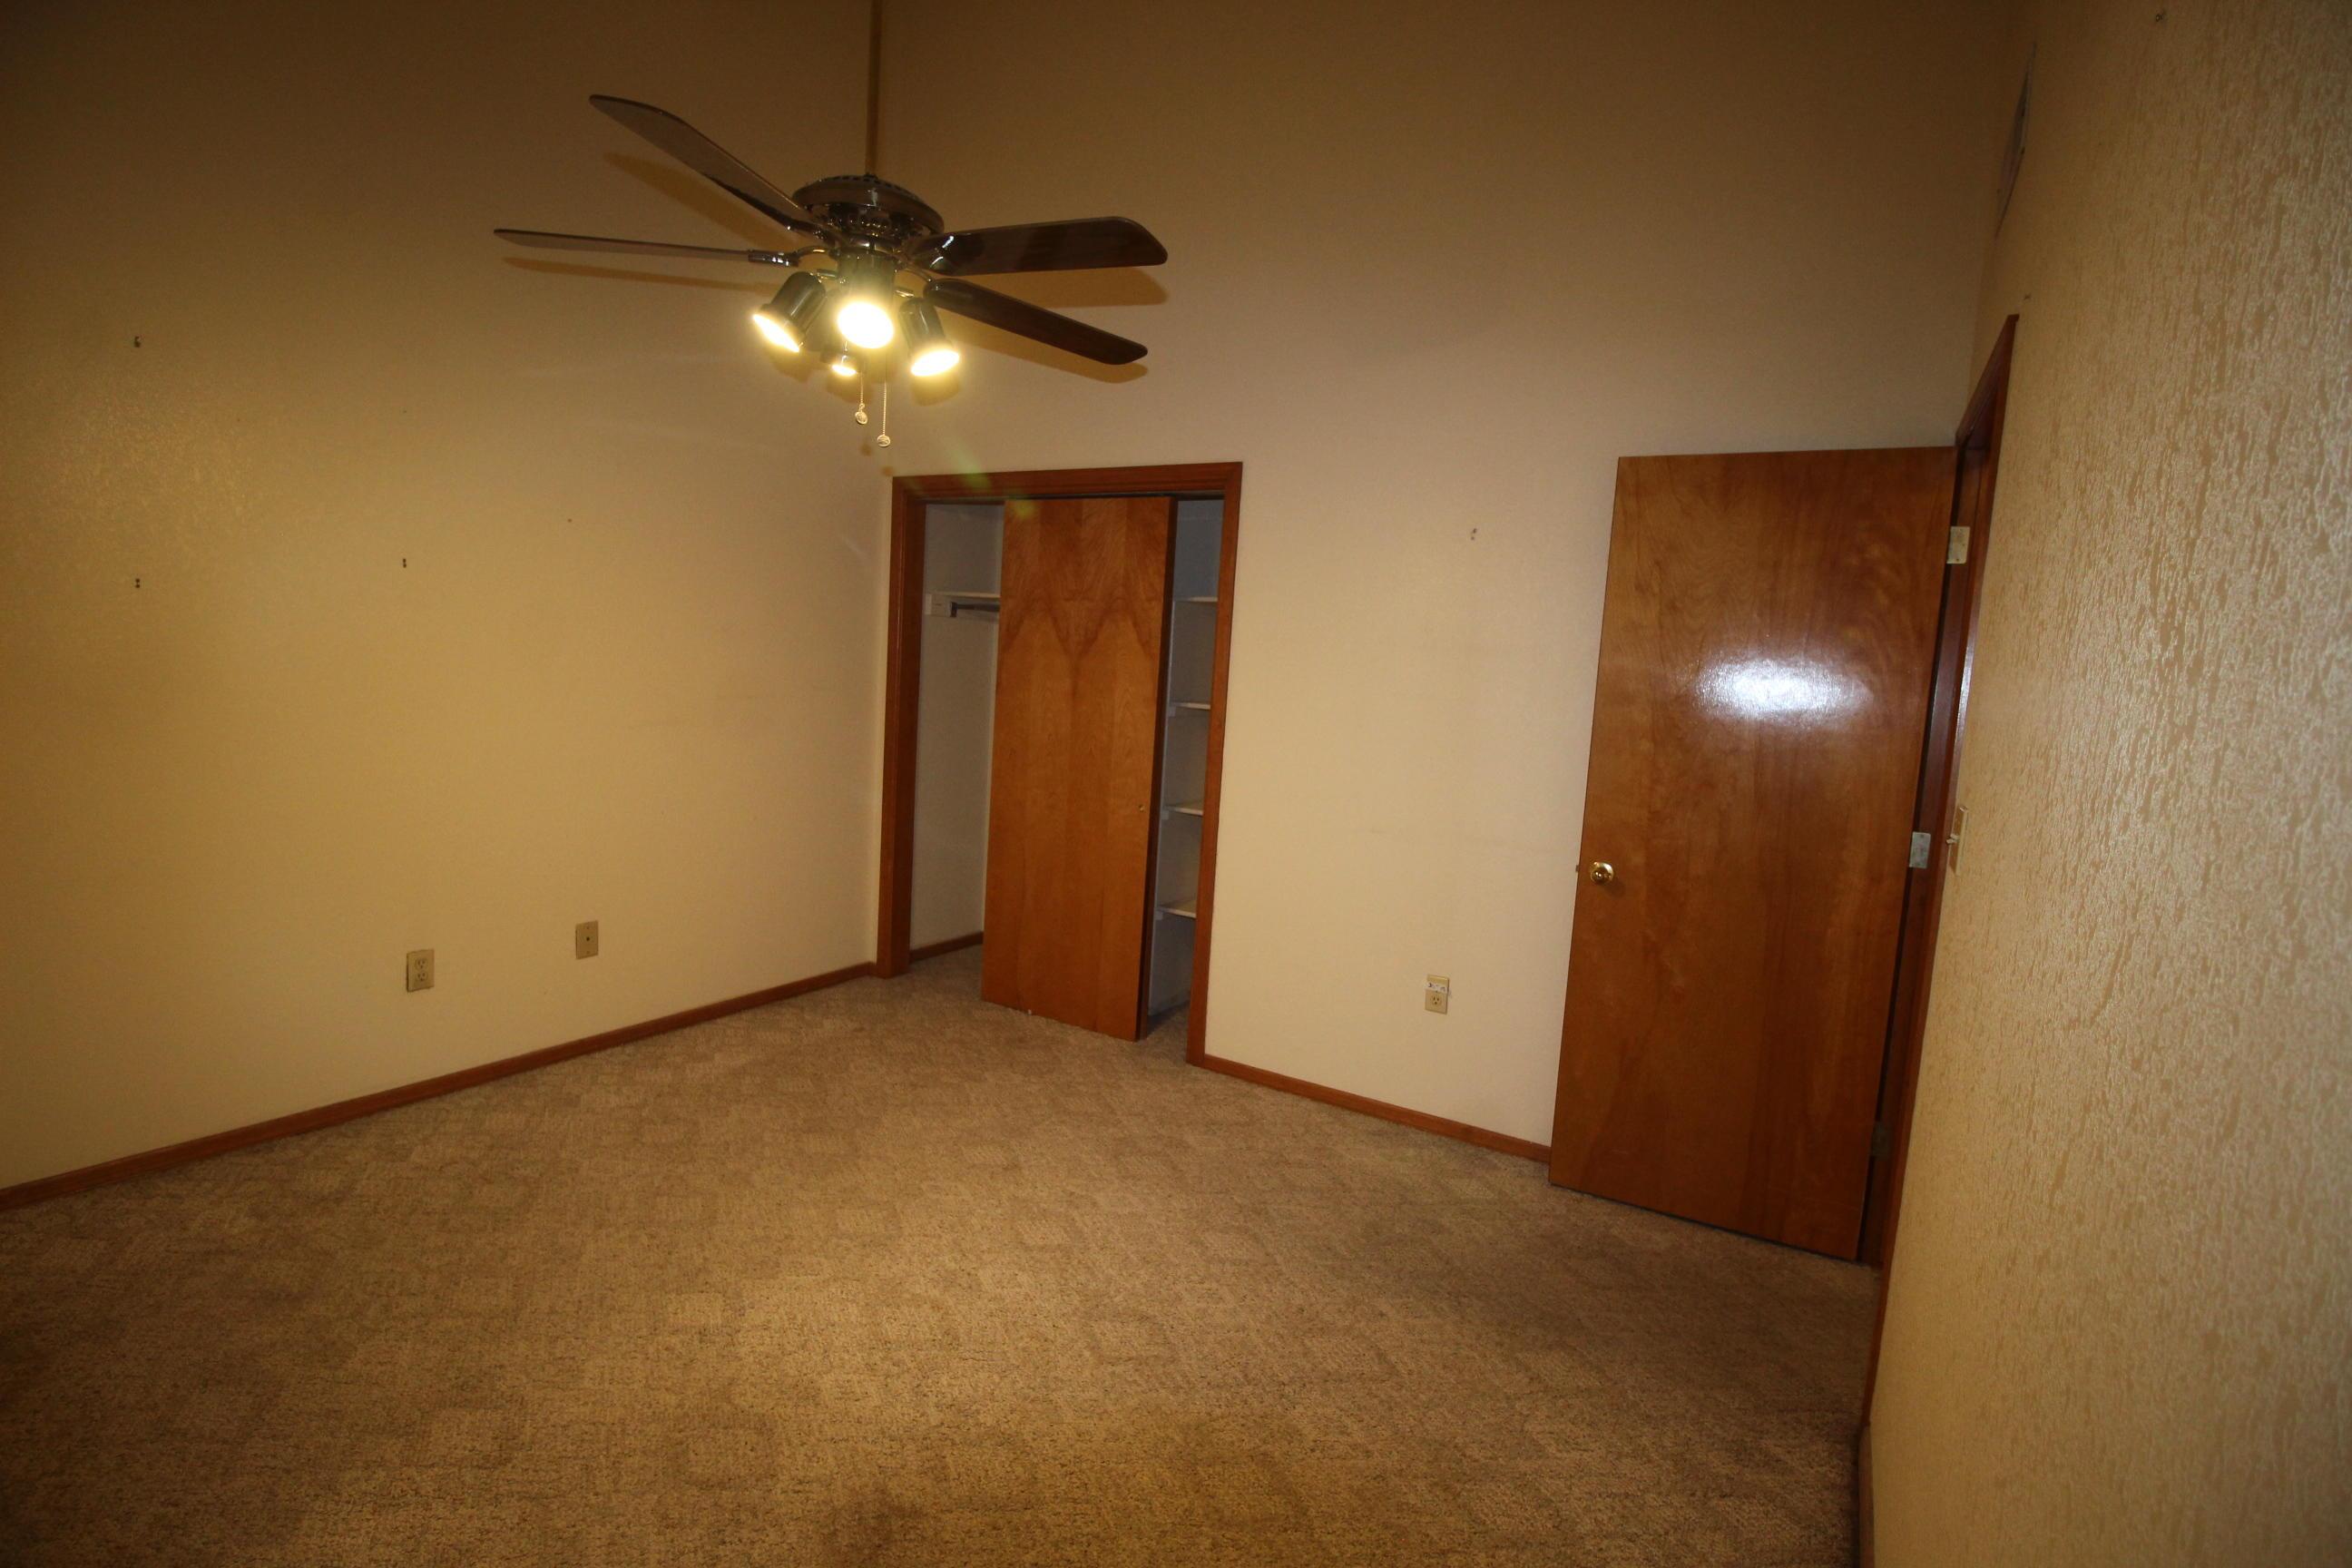 2032 SUN COUNTRY, El Paso, Texas 79938, 3 Bedrooms Bedrooms, ,2 BathroomsBathrooms,Residential,For sale,SUN COUNTRY,837461